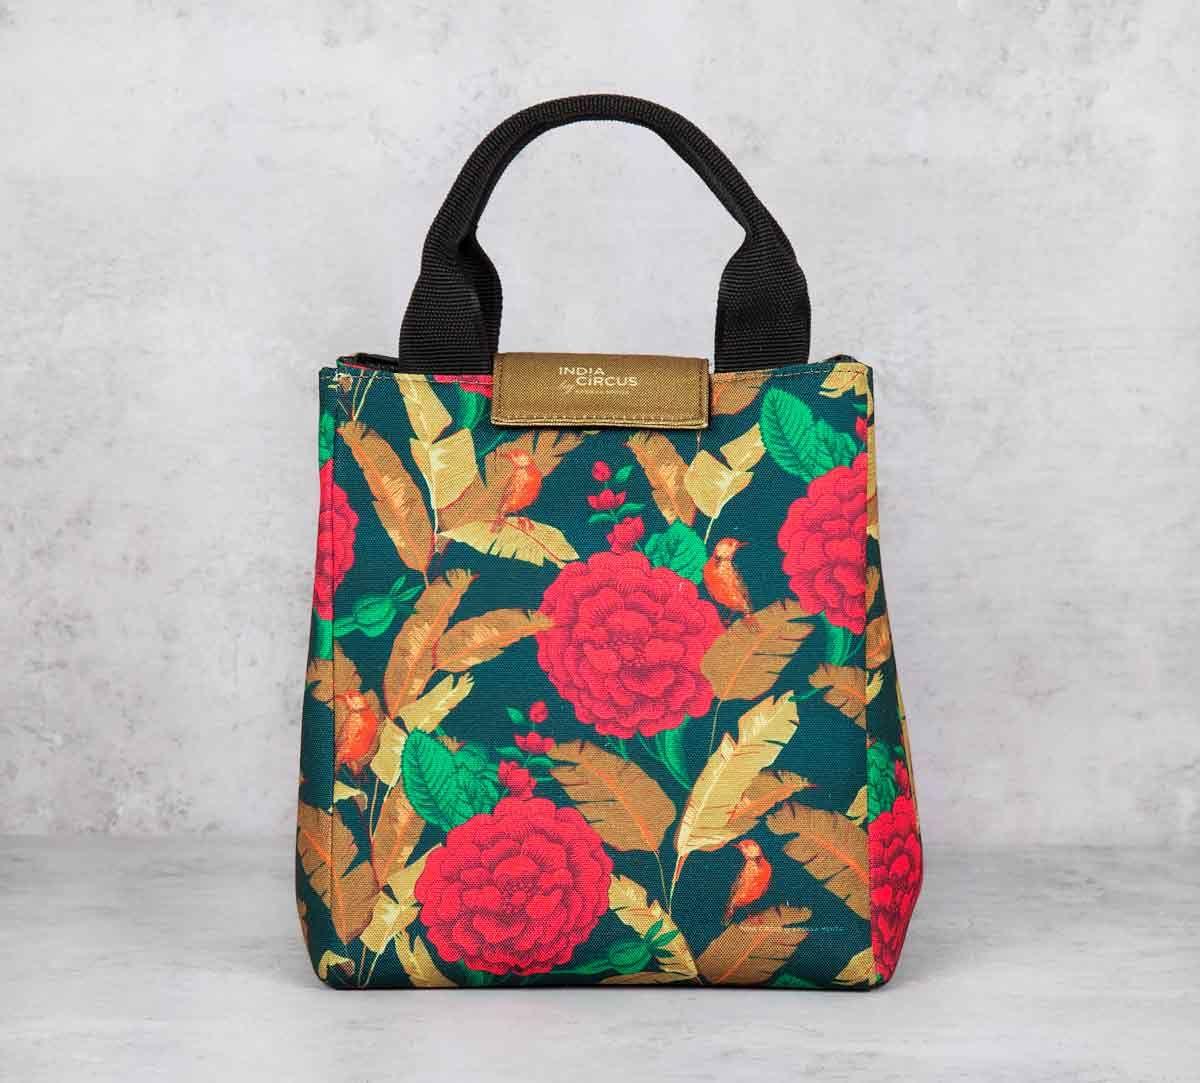 India Circus Bayrose Romance Lunch Bag